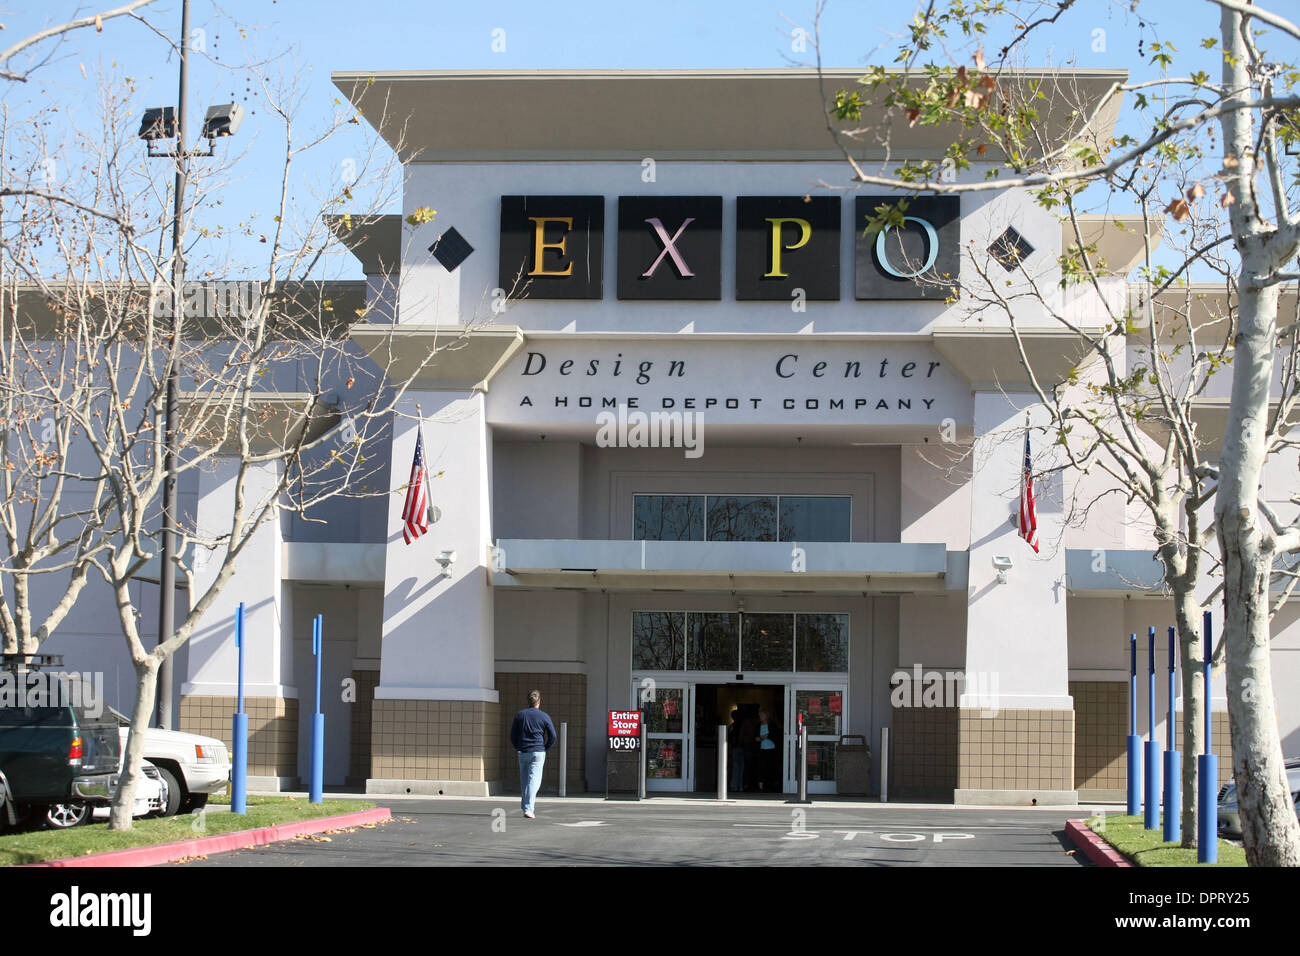 Jan 27 2009 Los Angeles California Usa An Expo Design Center Stock Photo Alamy